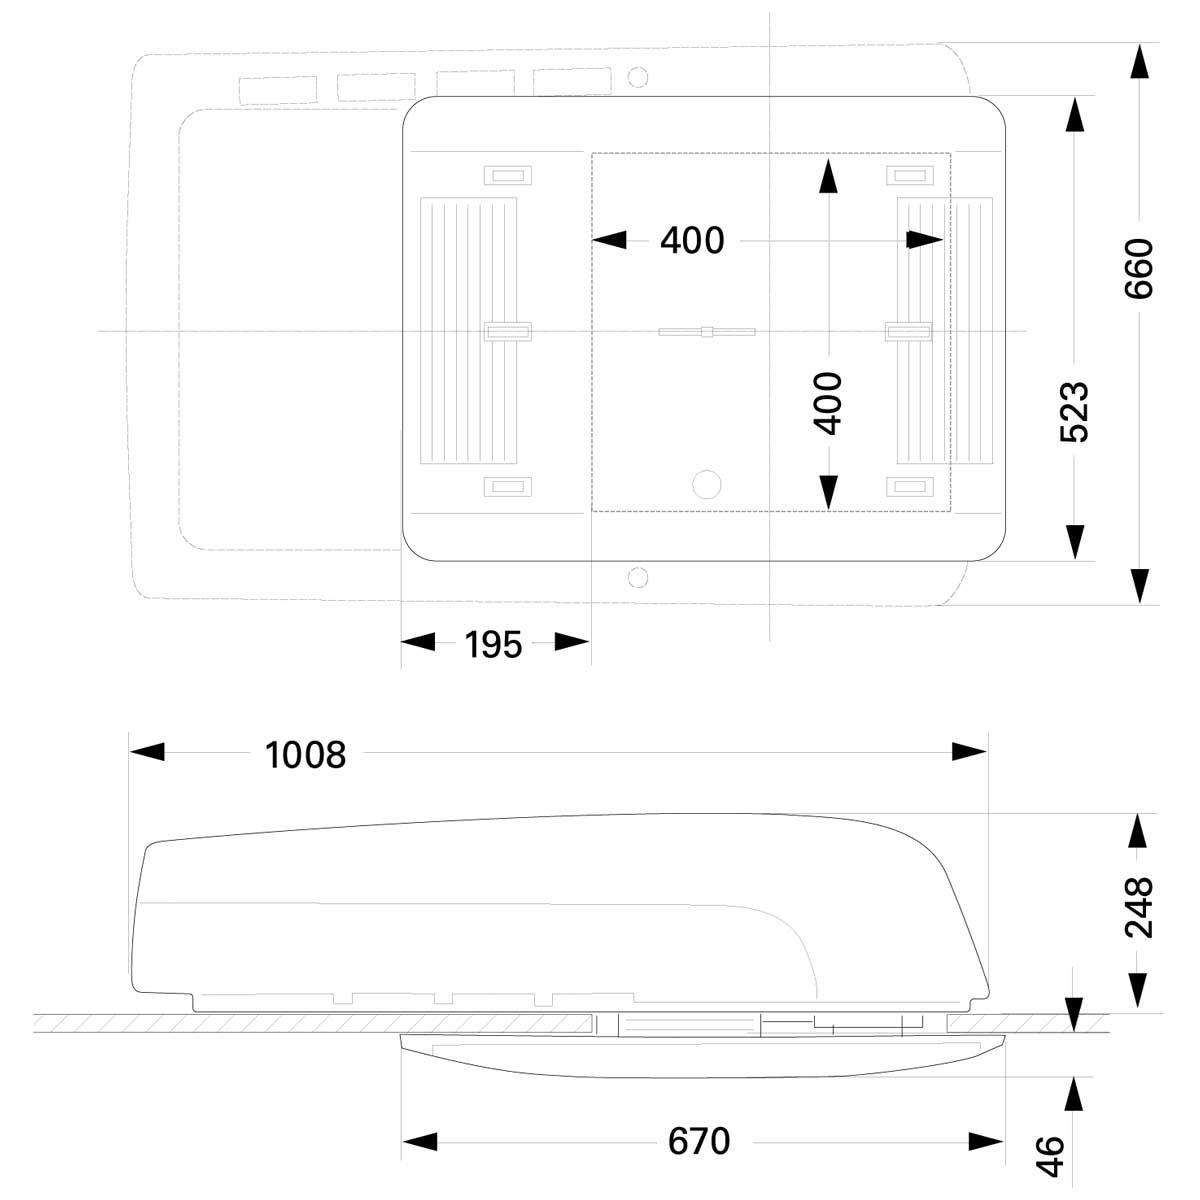 Truma Aventa Comfort Air Conditioning Unit With Air Distribution Unit Dimensions large